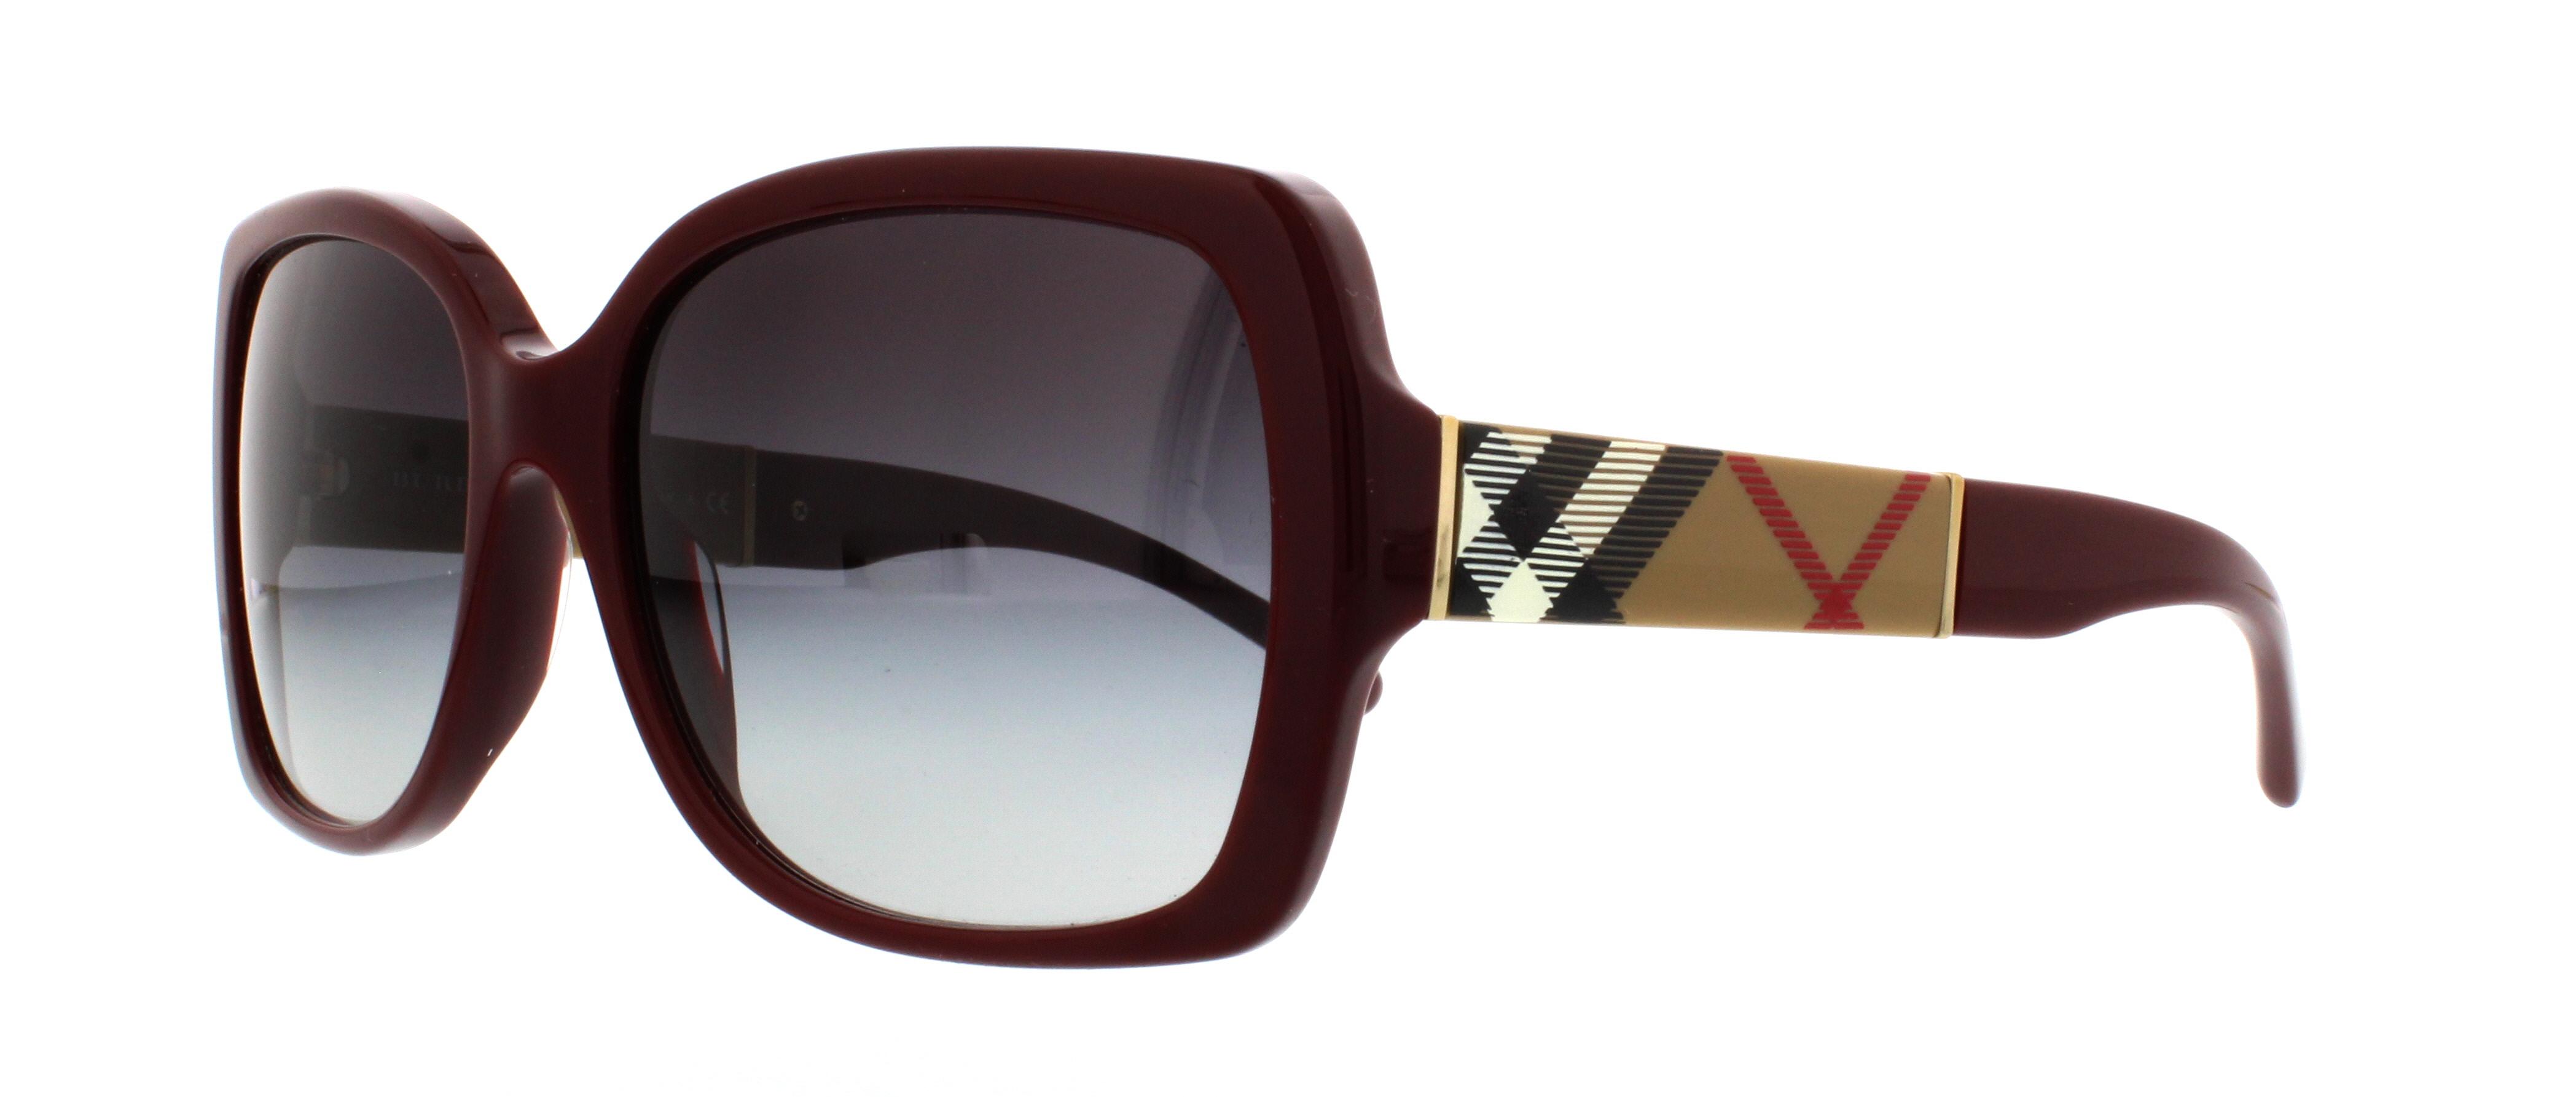 BURBERRY Sunglasses BE4160 34038G Bordeaux 58MM   eBay d8b2b8520d84